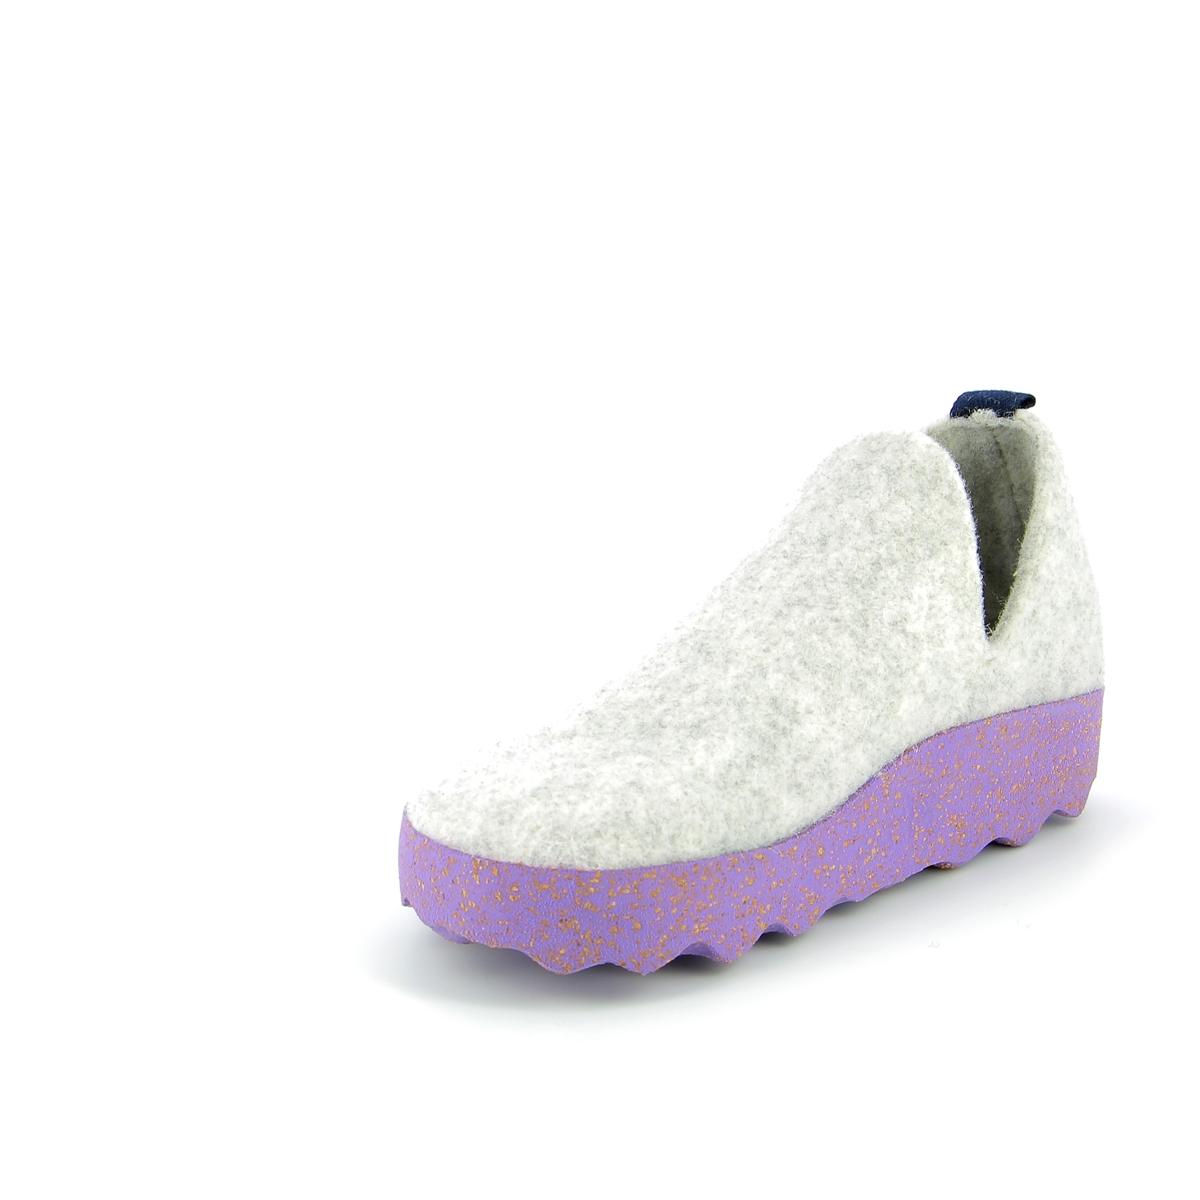 Asportuguesas Pantoffels parel